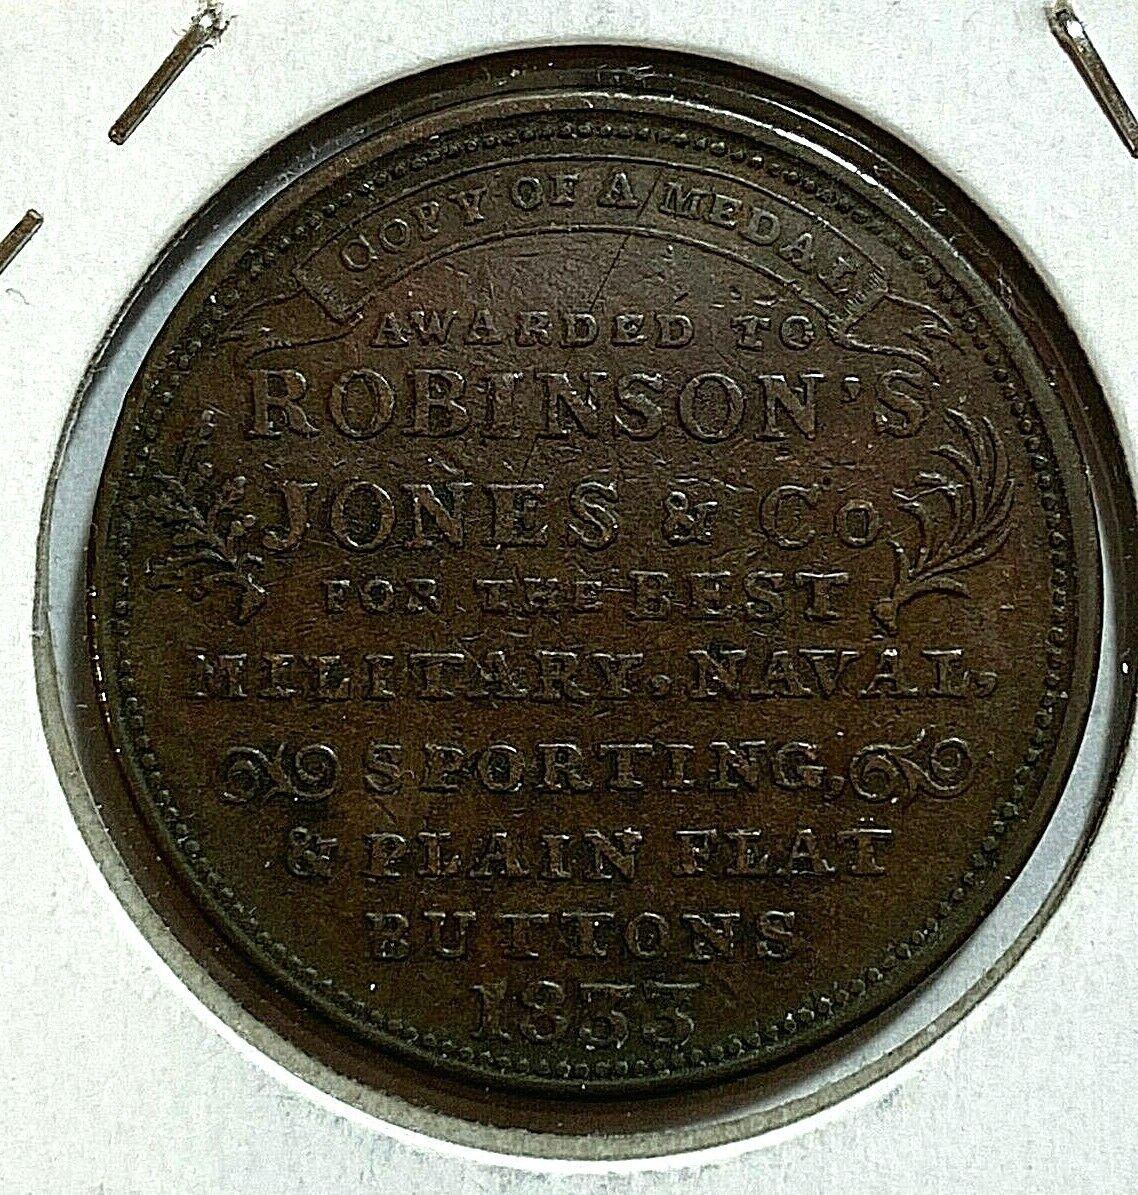 Hard Times Token Attleboro, MA 1833 Robinson Jones Co HT-153 XF - $35.00